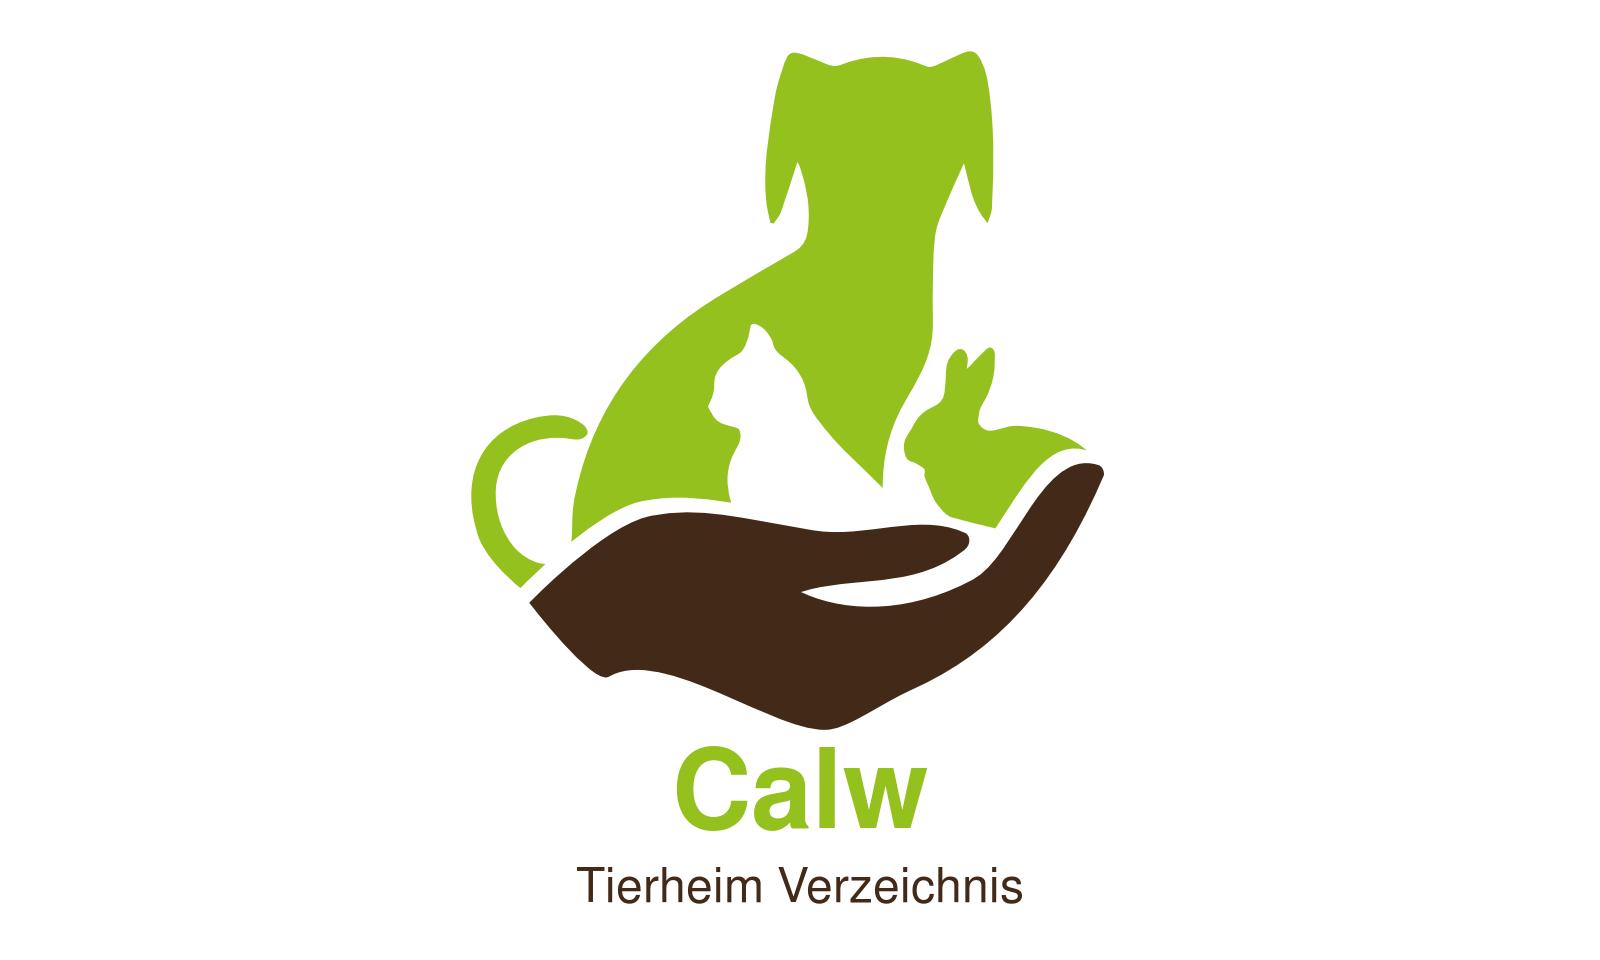 Tierheim Calw